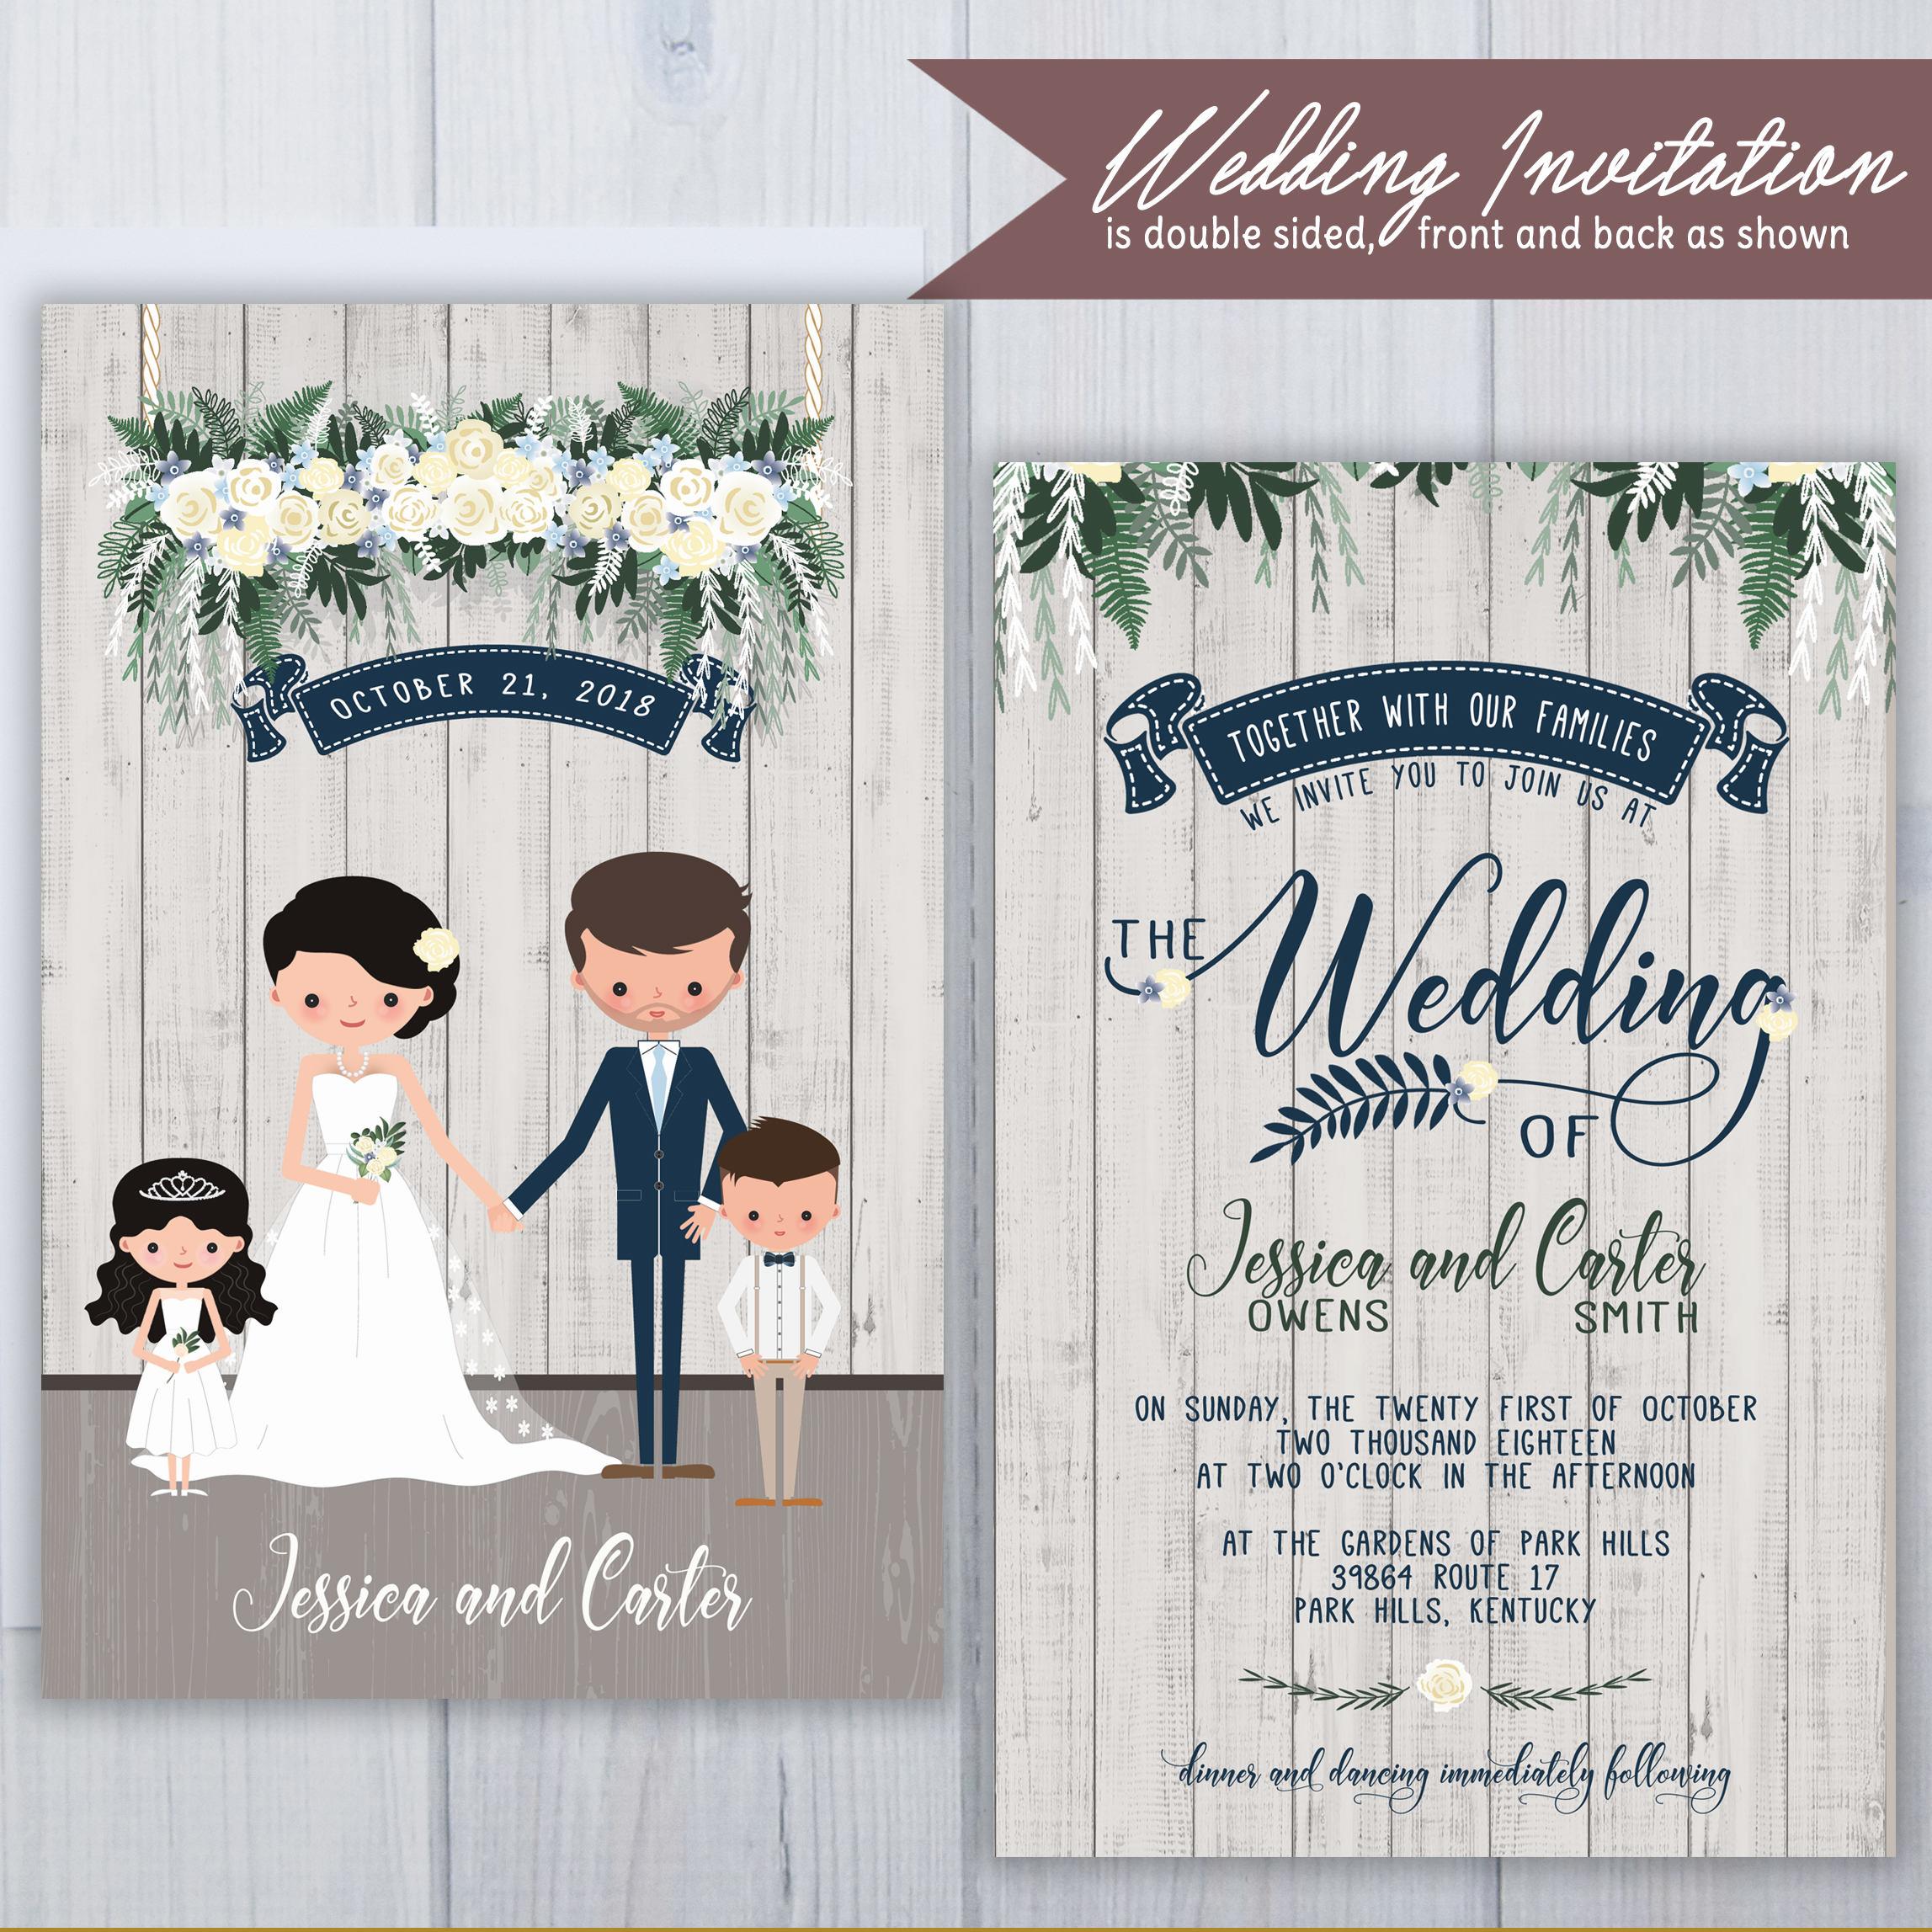 Blended Family Wedding Invitations | Illustrated Wedding Invitations ...